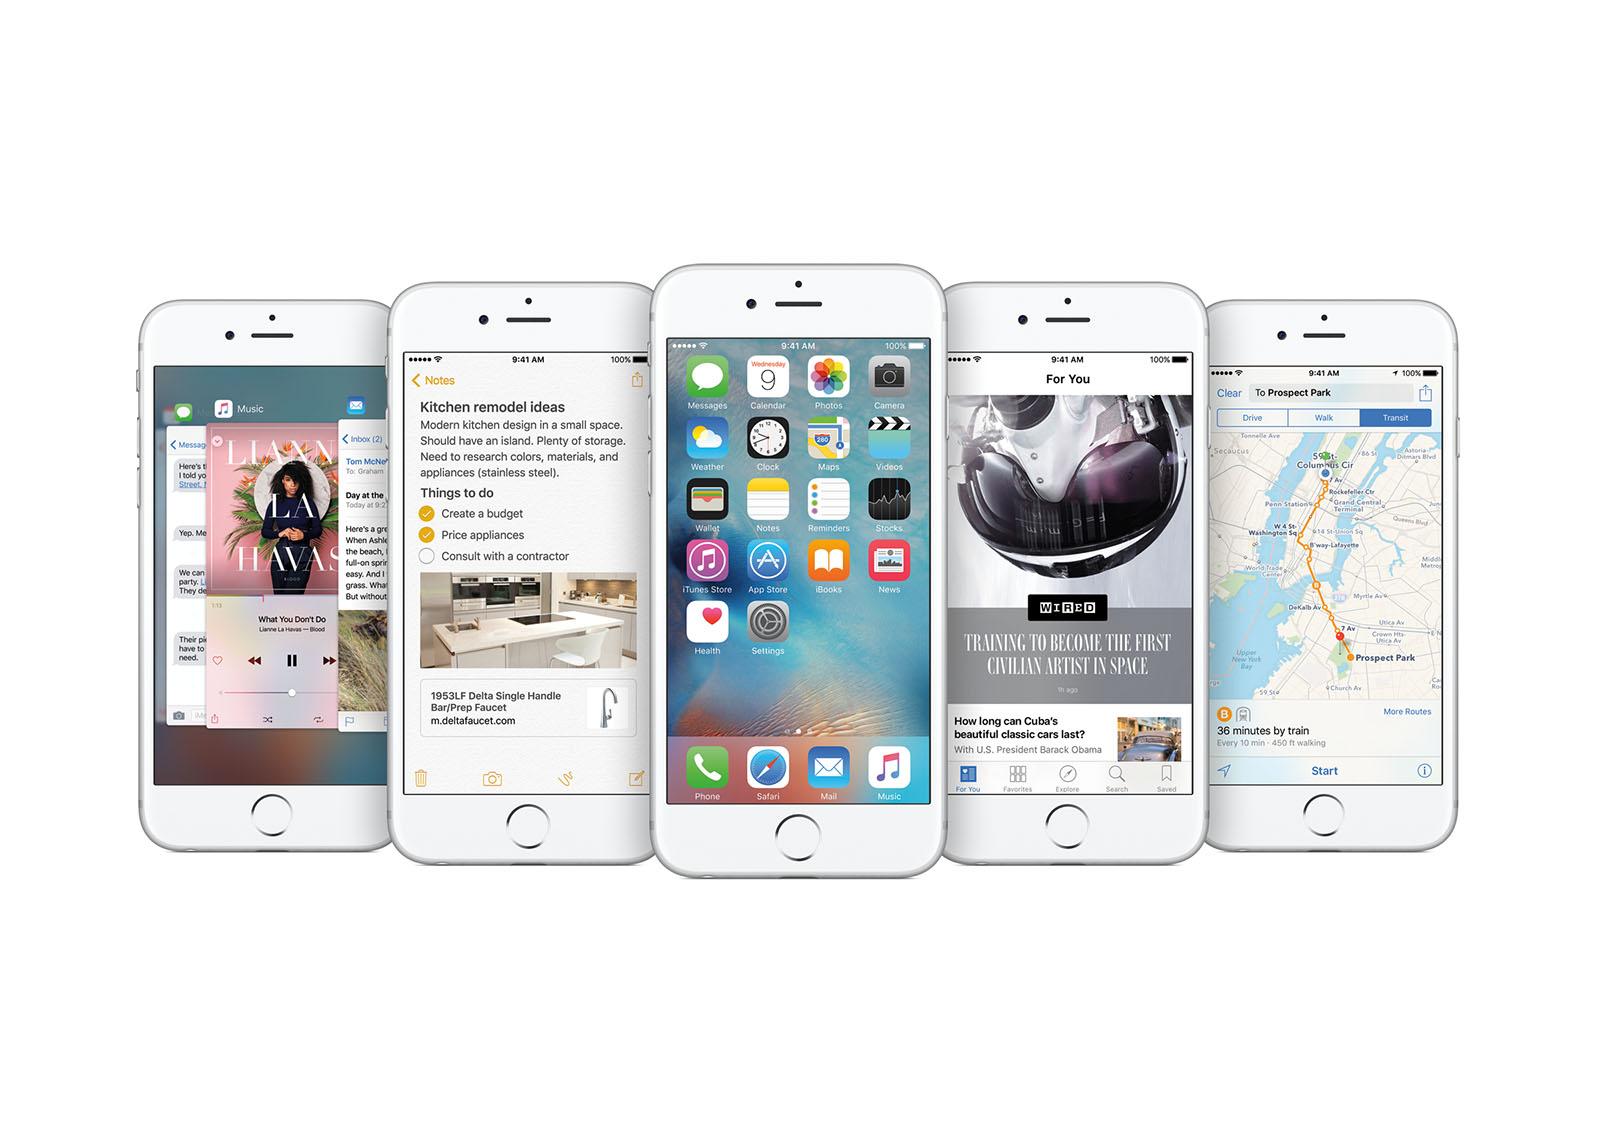 iPhone 6s / 6s Plusの発売に人気ゲームアプリのiOS 9対応は